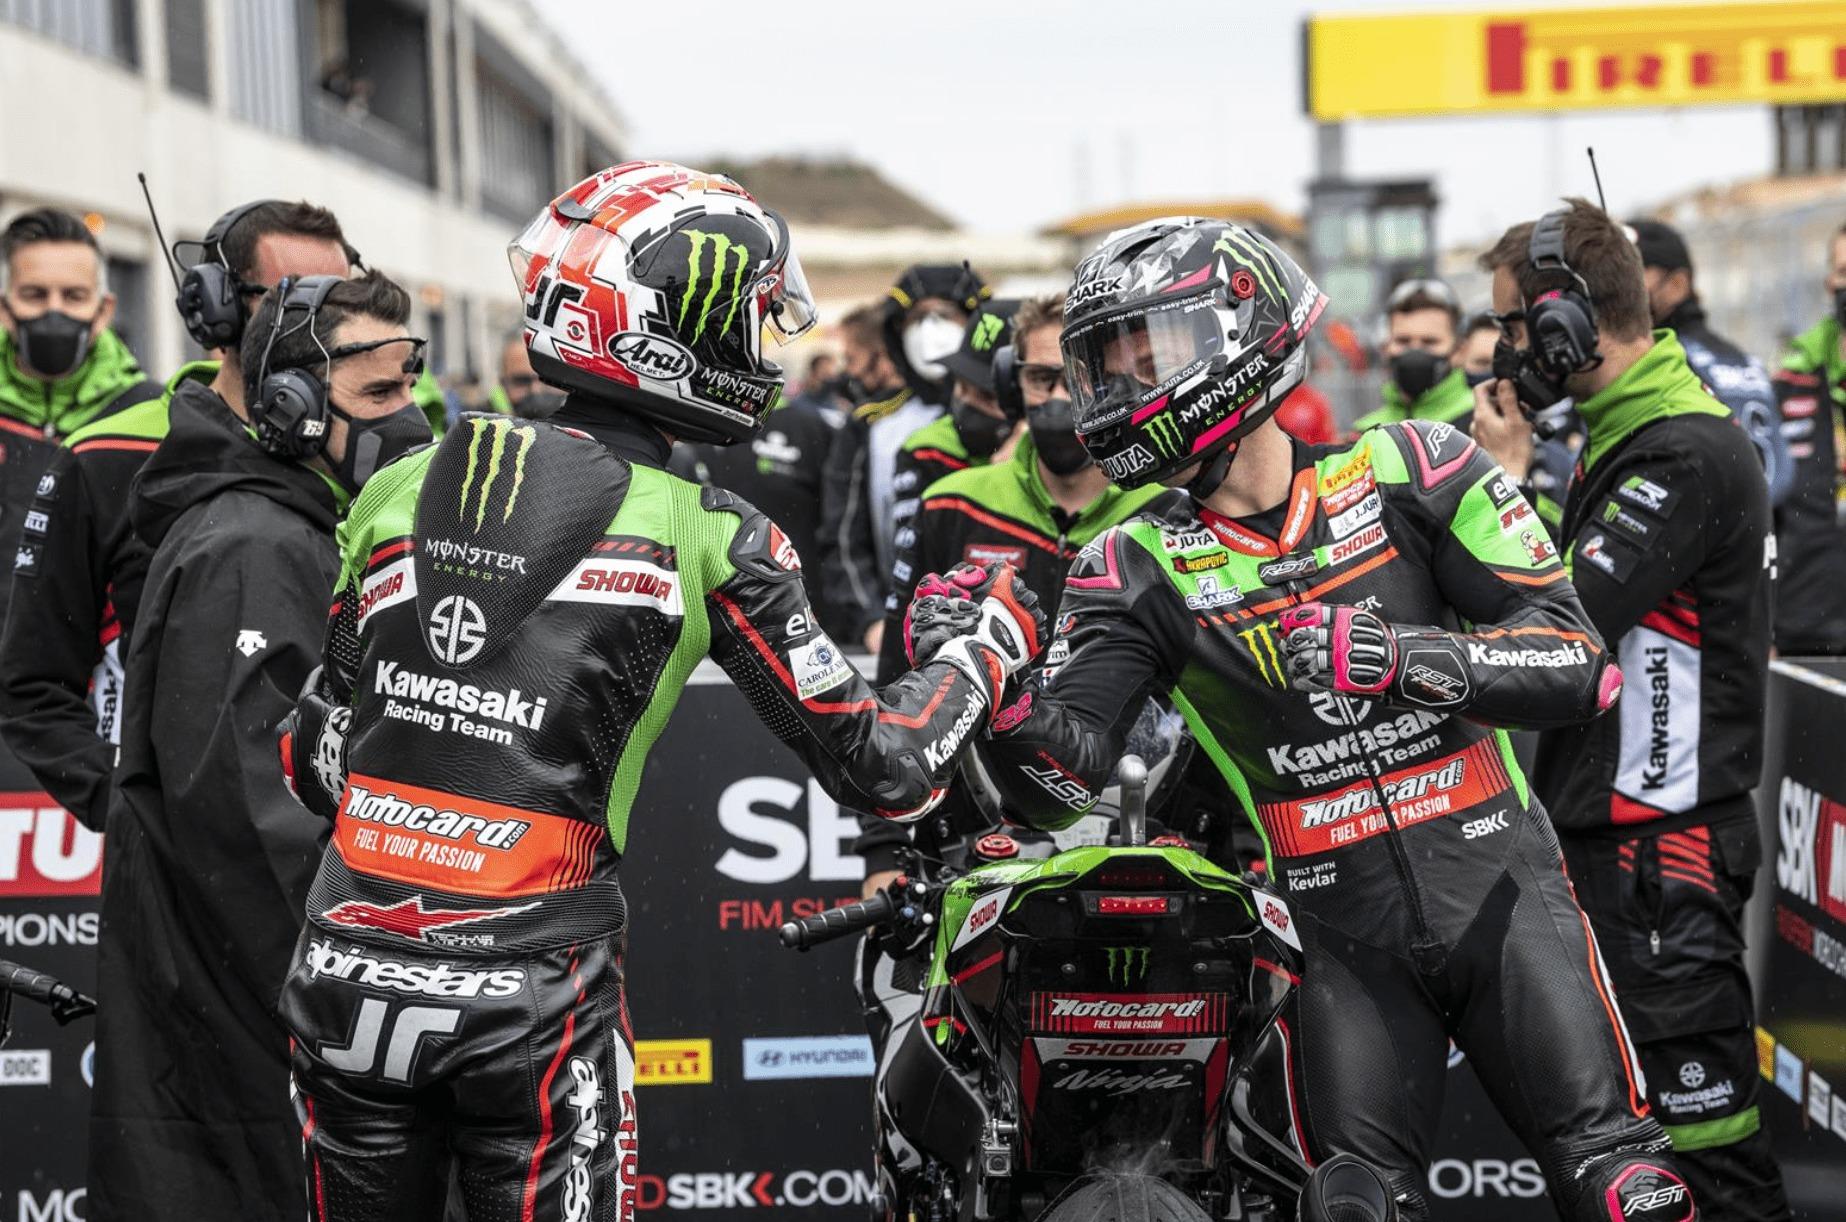 FIM スーパーバイク世界選手権(SBK)2021アラゴン戦 レース2 2位ジョナサン・レイ「レース2の2位は優勝に等しい」